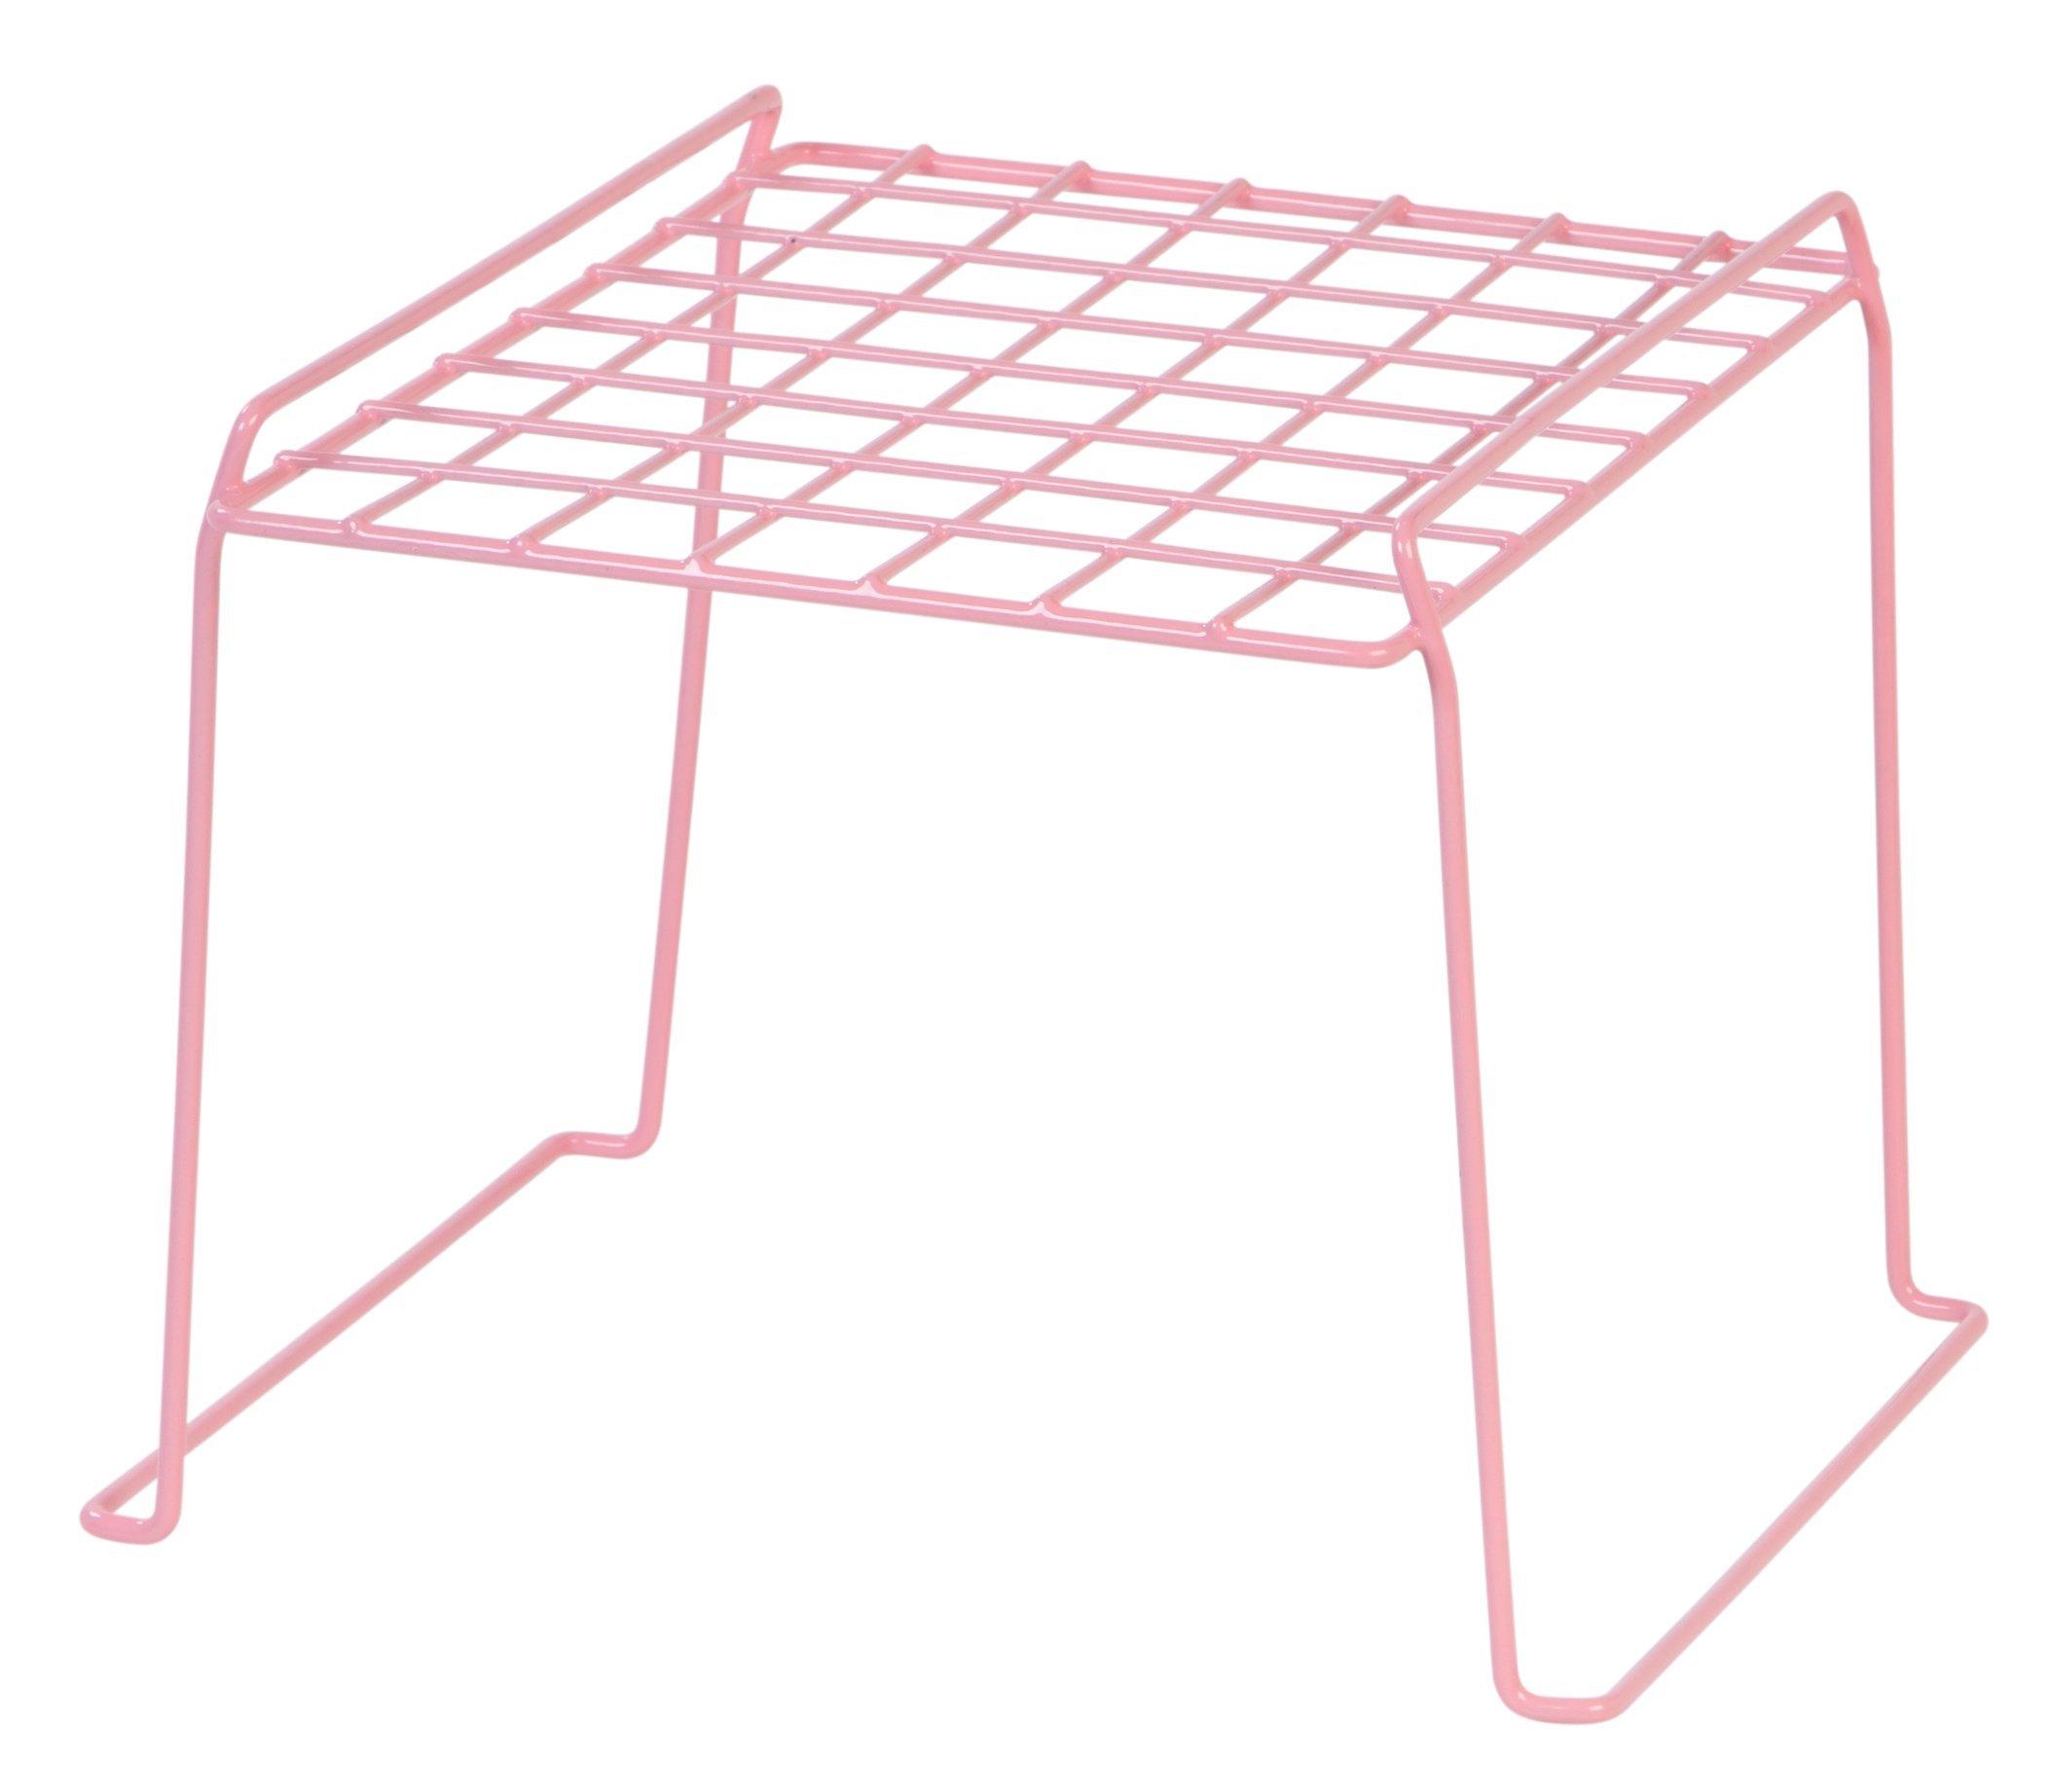 IRIS 8-inch Stackable Wire Locker Shelf, 4-Pack, Pink by IRIS USA, Inc.